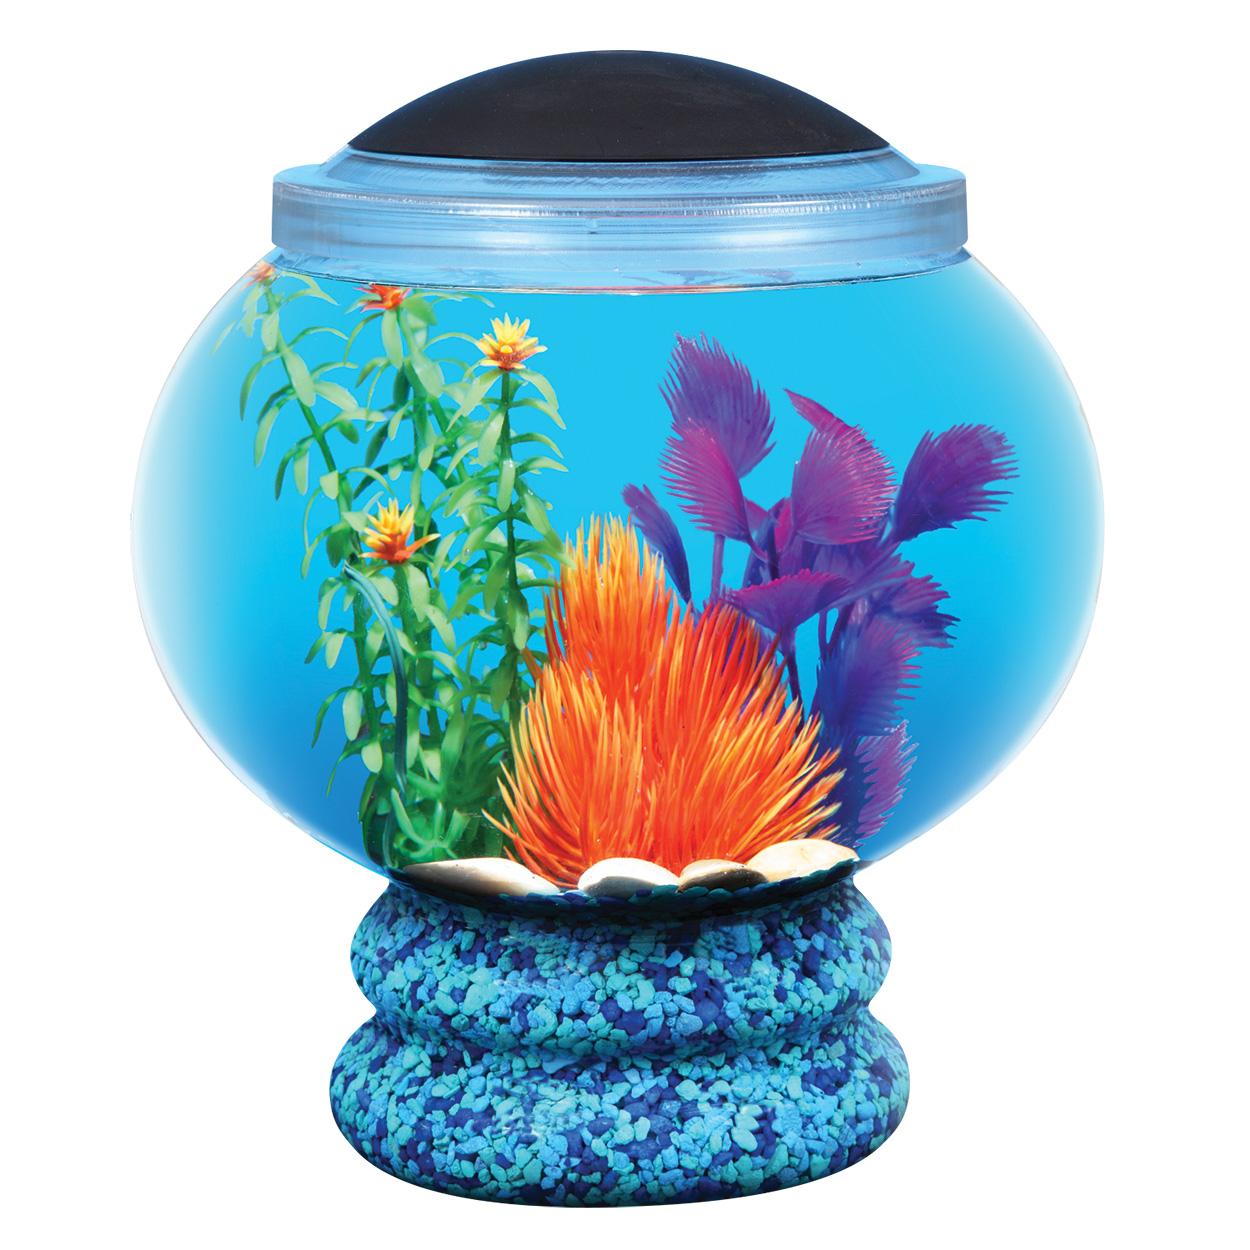 API Betta Bowl with Pedestal Aquarium Kit - 1.6 gal 65208